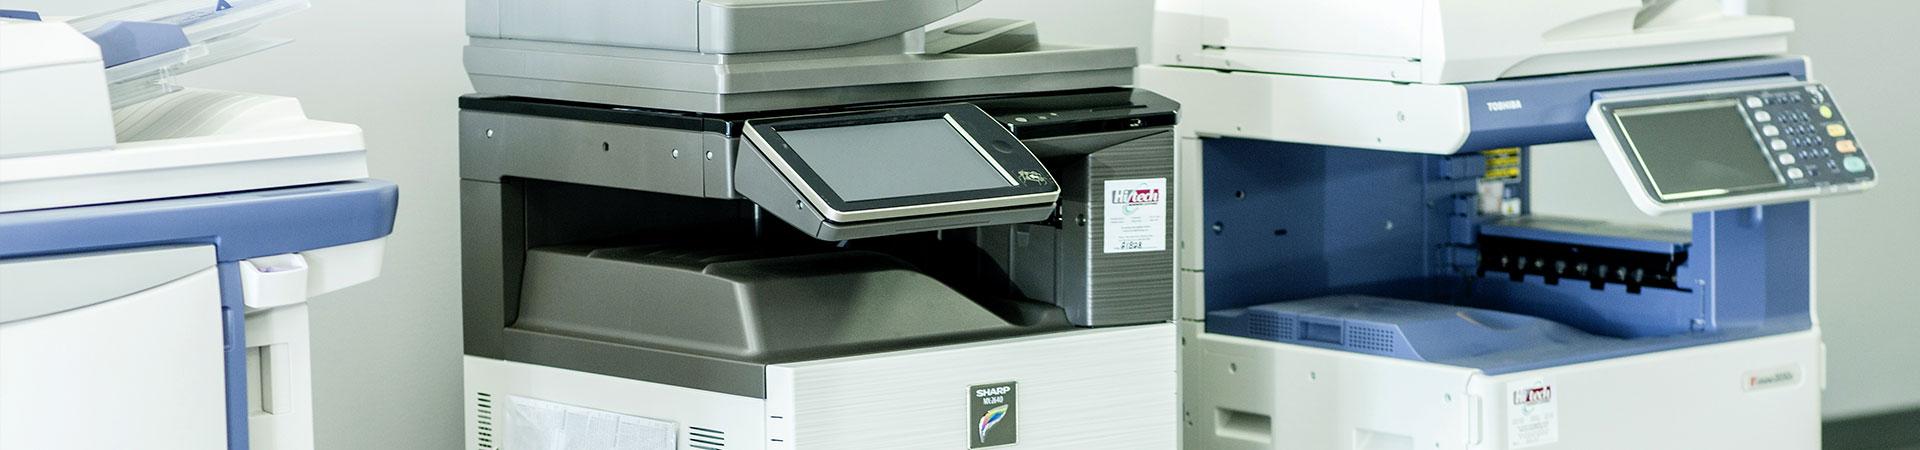 copiers